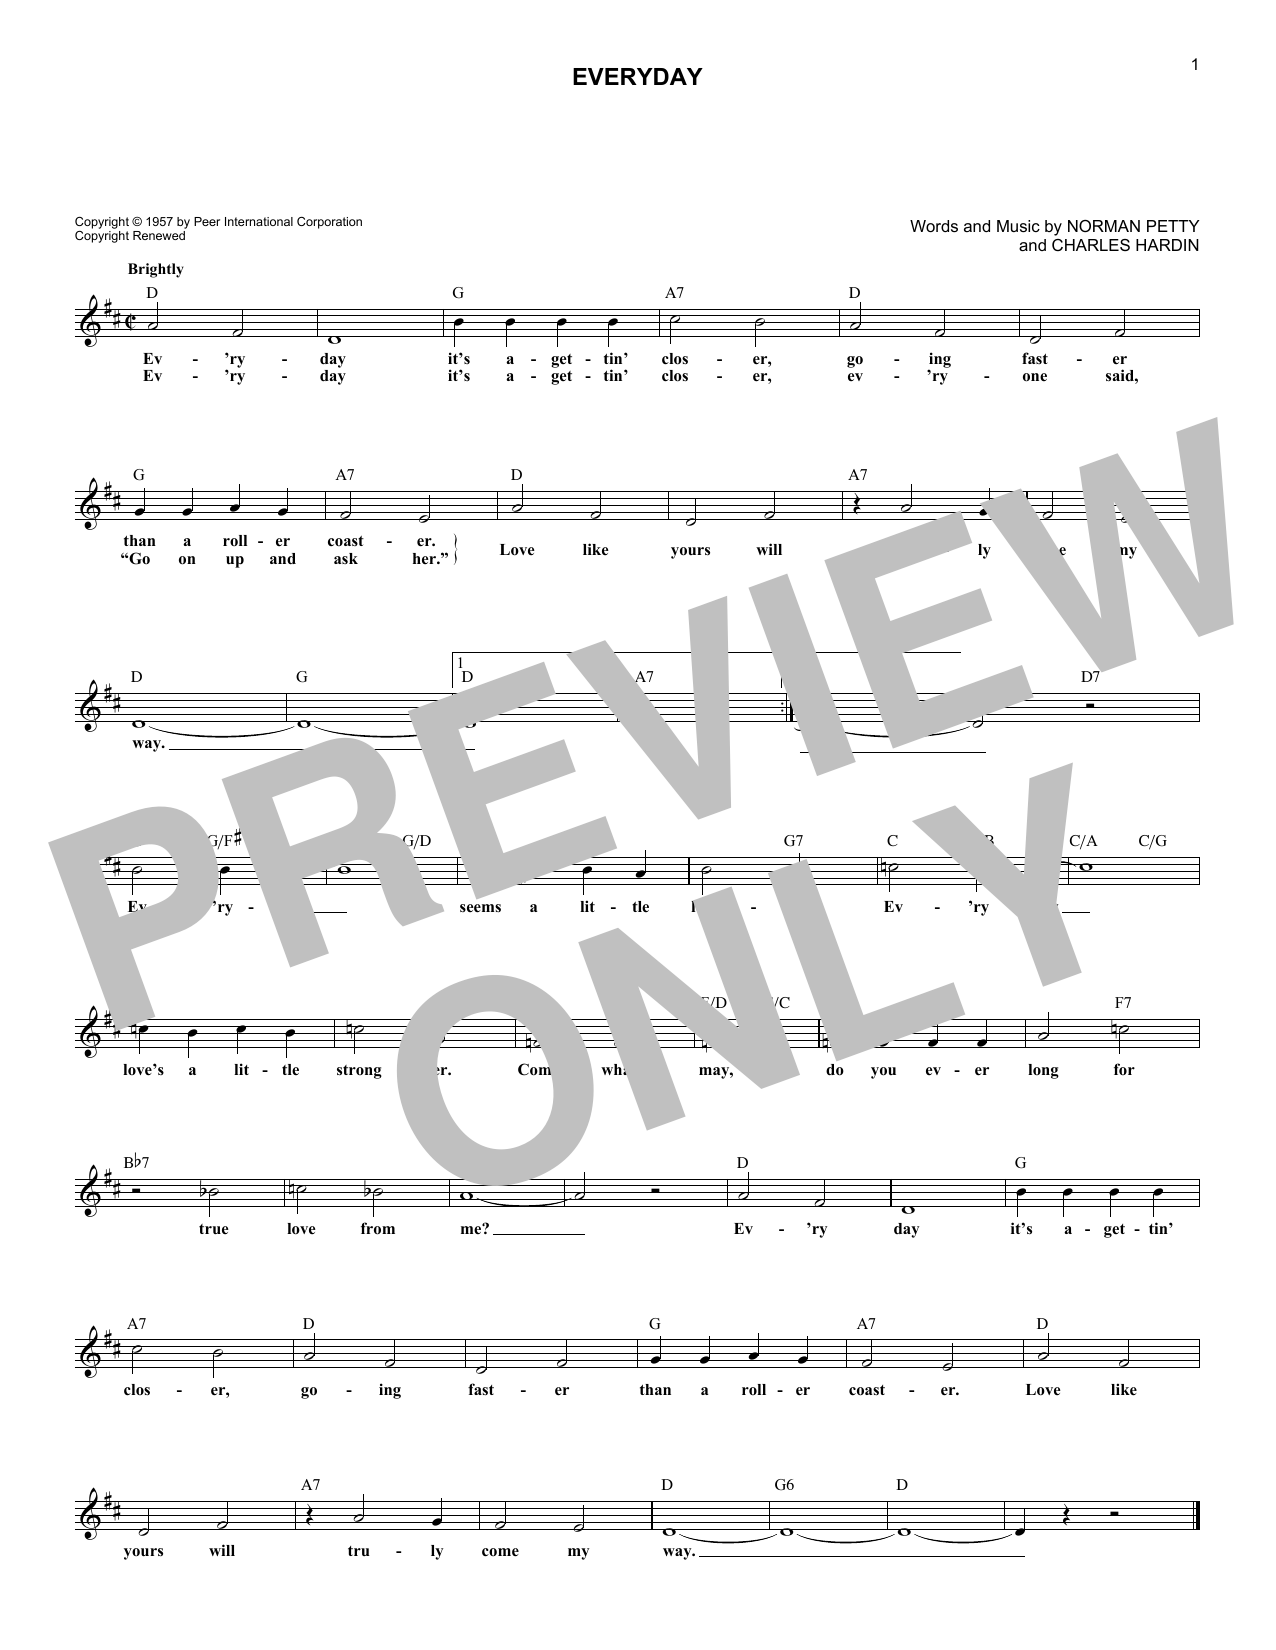 Everyday Sheet Music